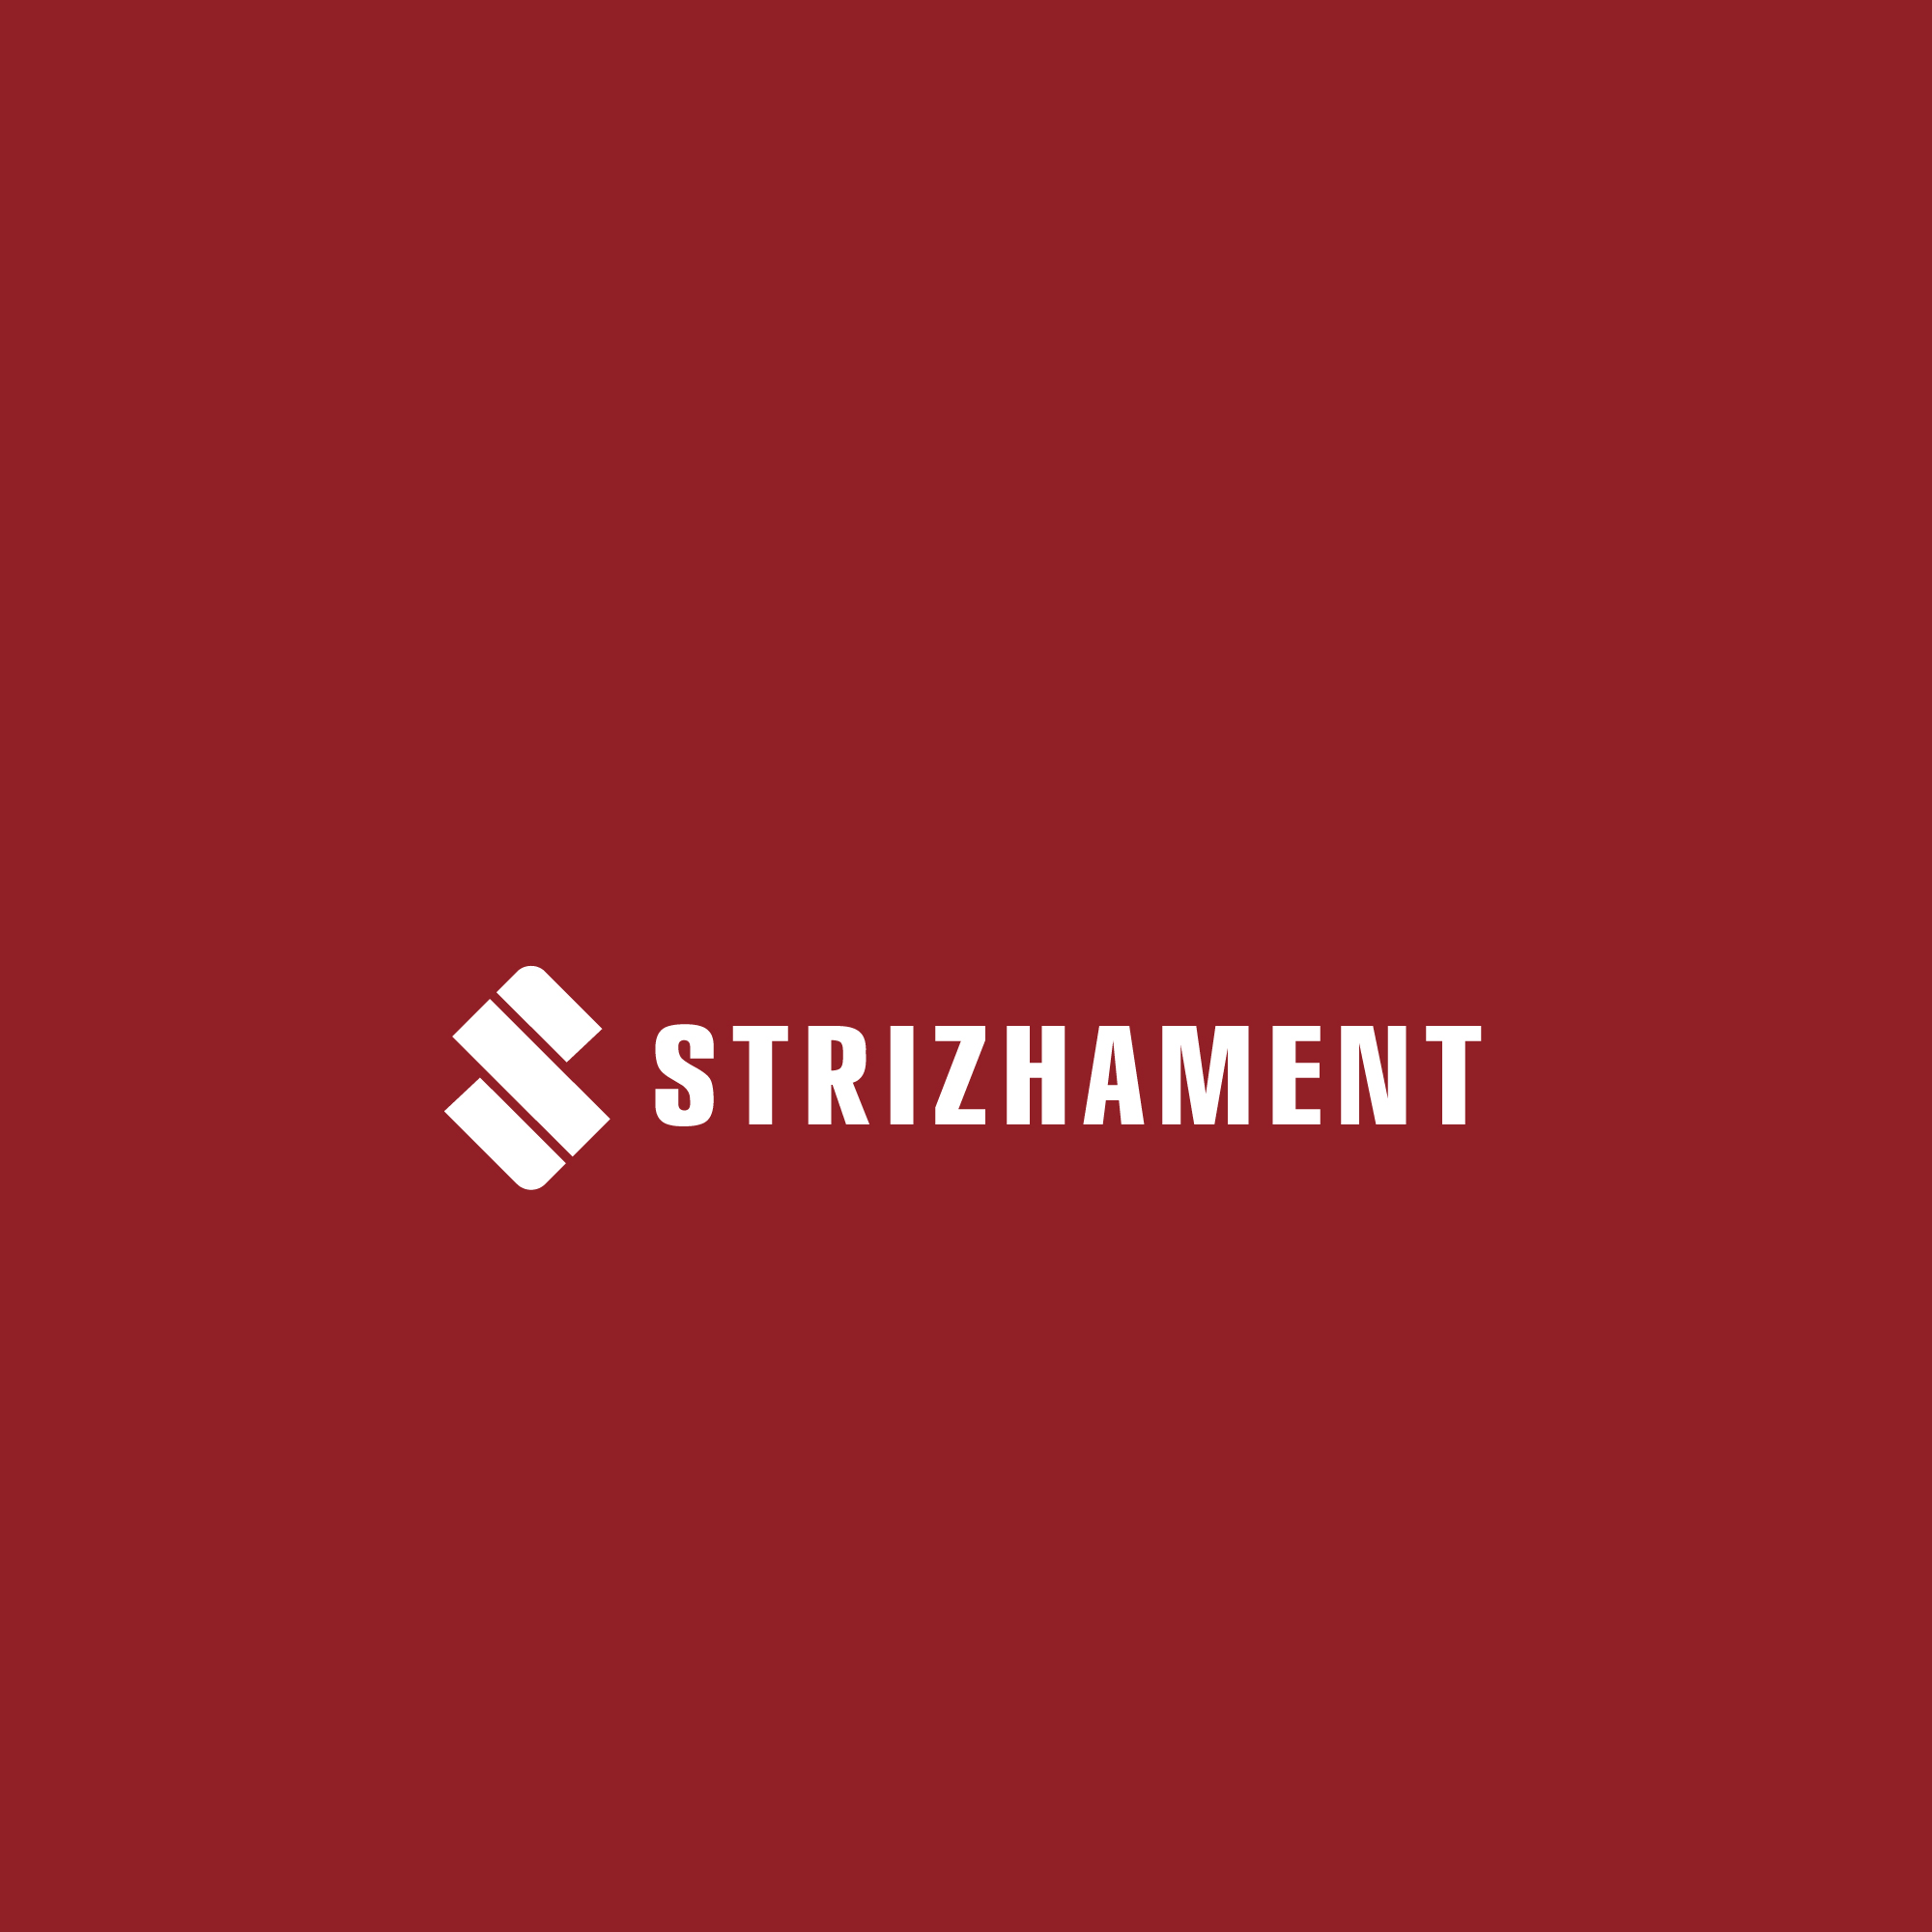 Дизайн лого бренда фото f_2795d52c0b20dc56.jpg